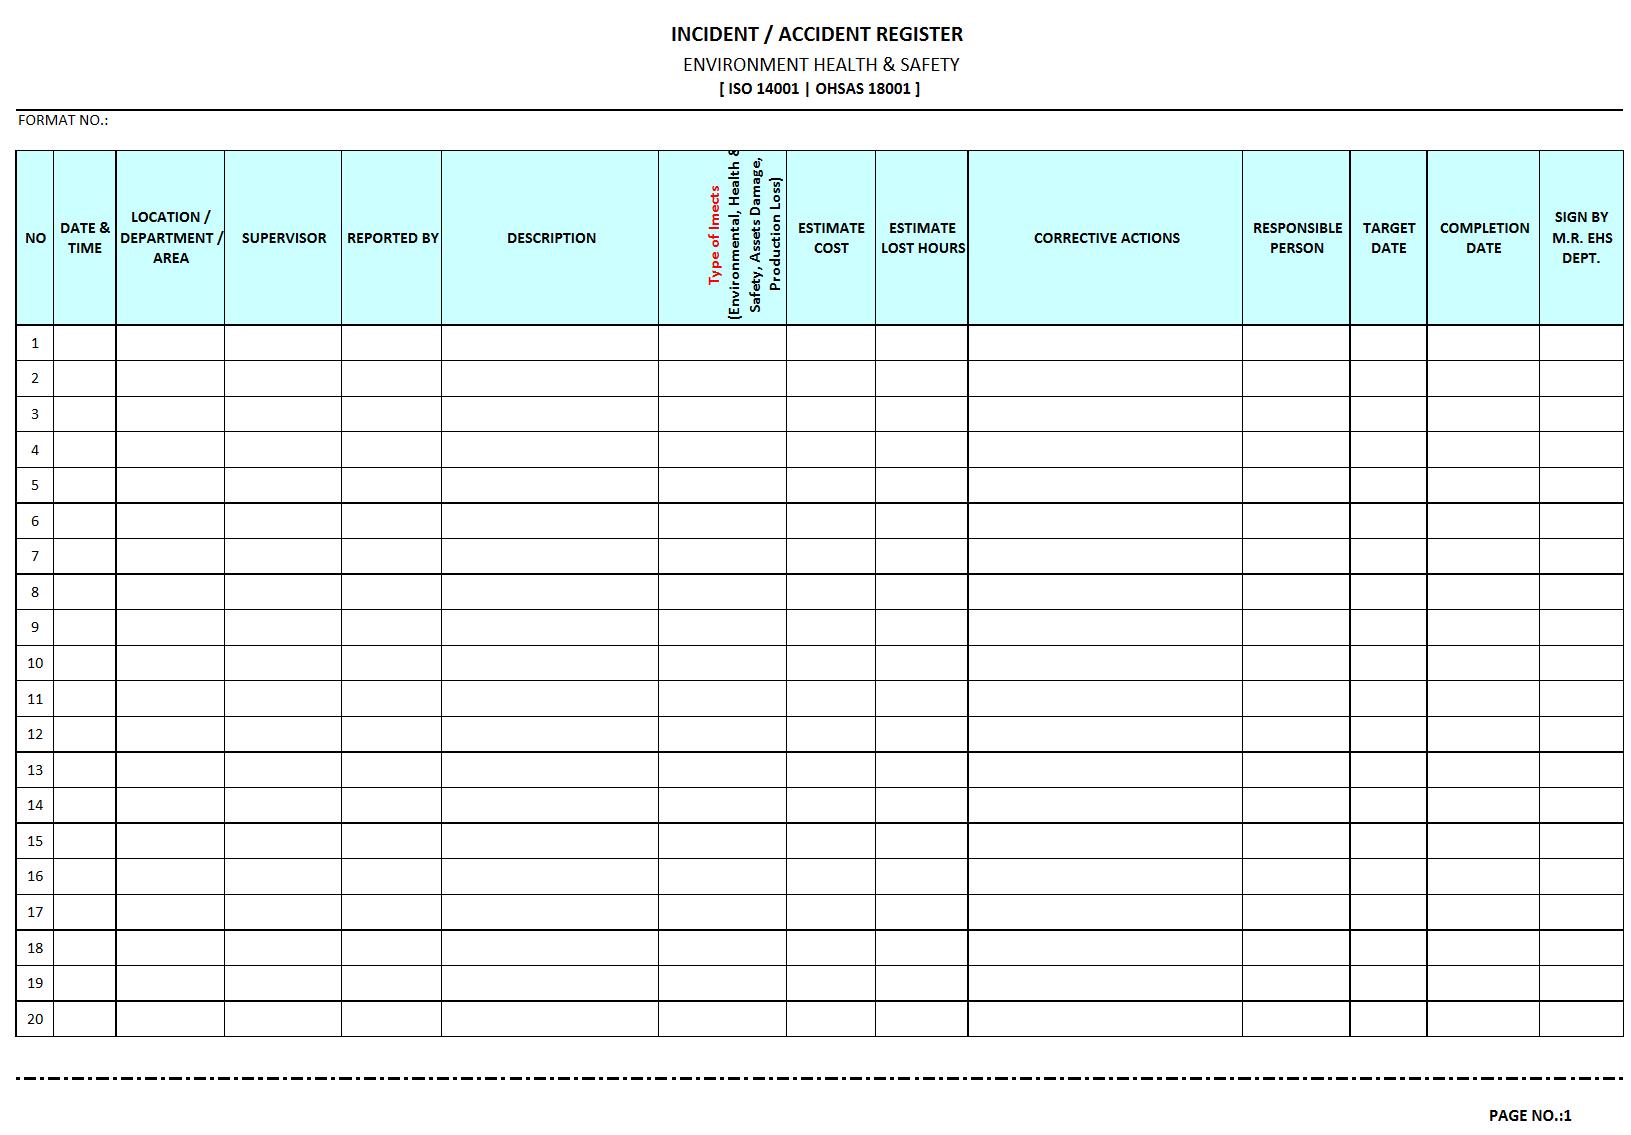 Incident / Accident Register - In Incident Report Register Template